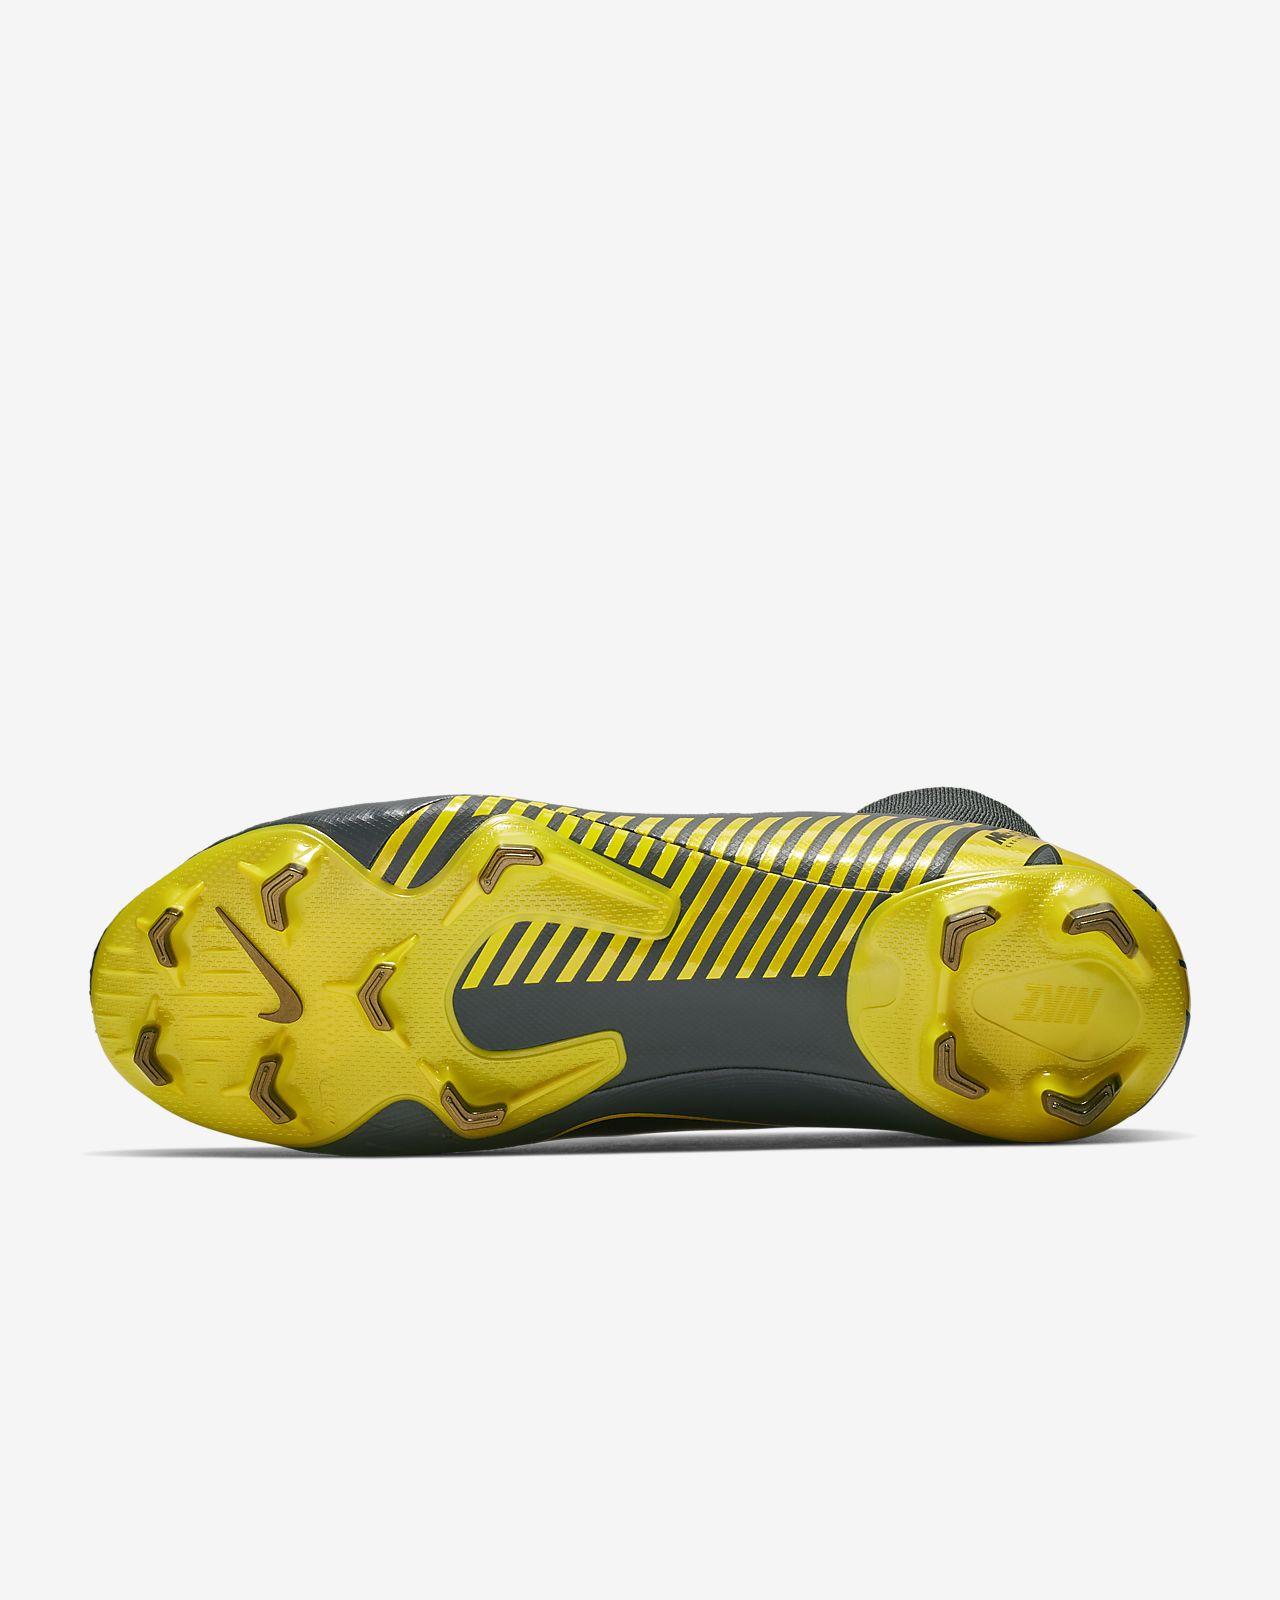 8dfef95bd75acd scarpa-da-calcio-per-terreni-duri-superfly-6-pro-fg-LbqbGT.jpg